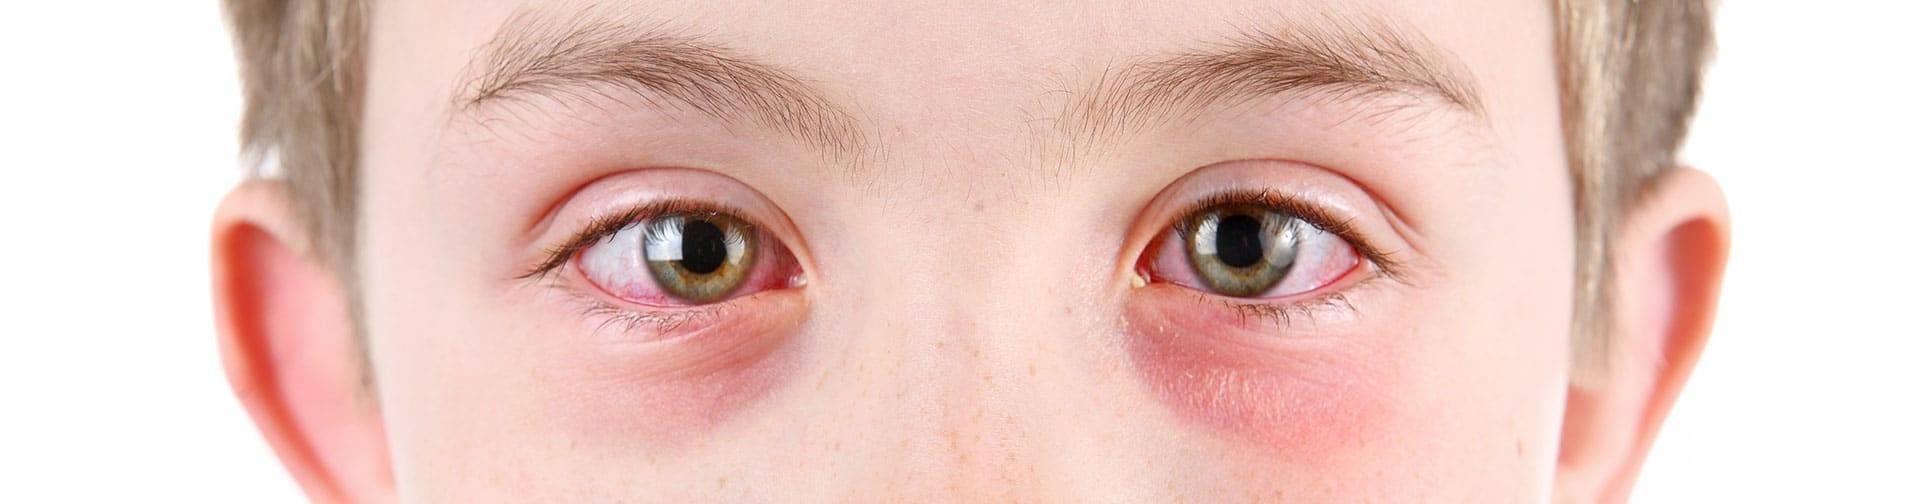 Конъюнктивит у ребенка: лечение глаз, симптомы с фото и профилактика заболевания